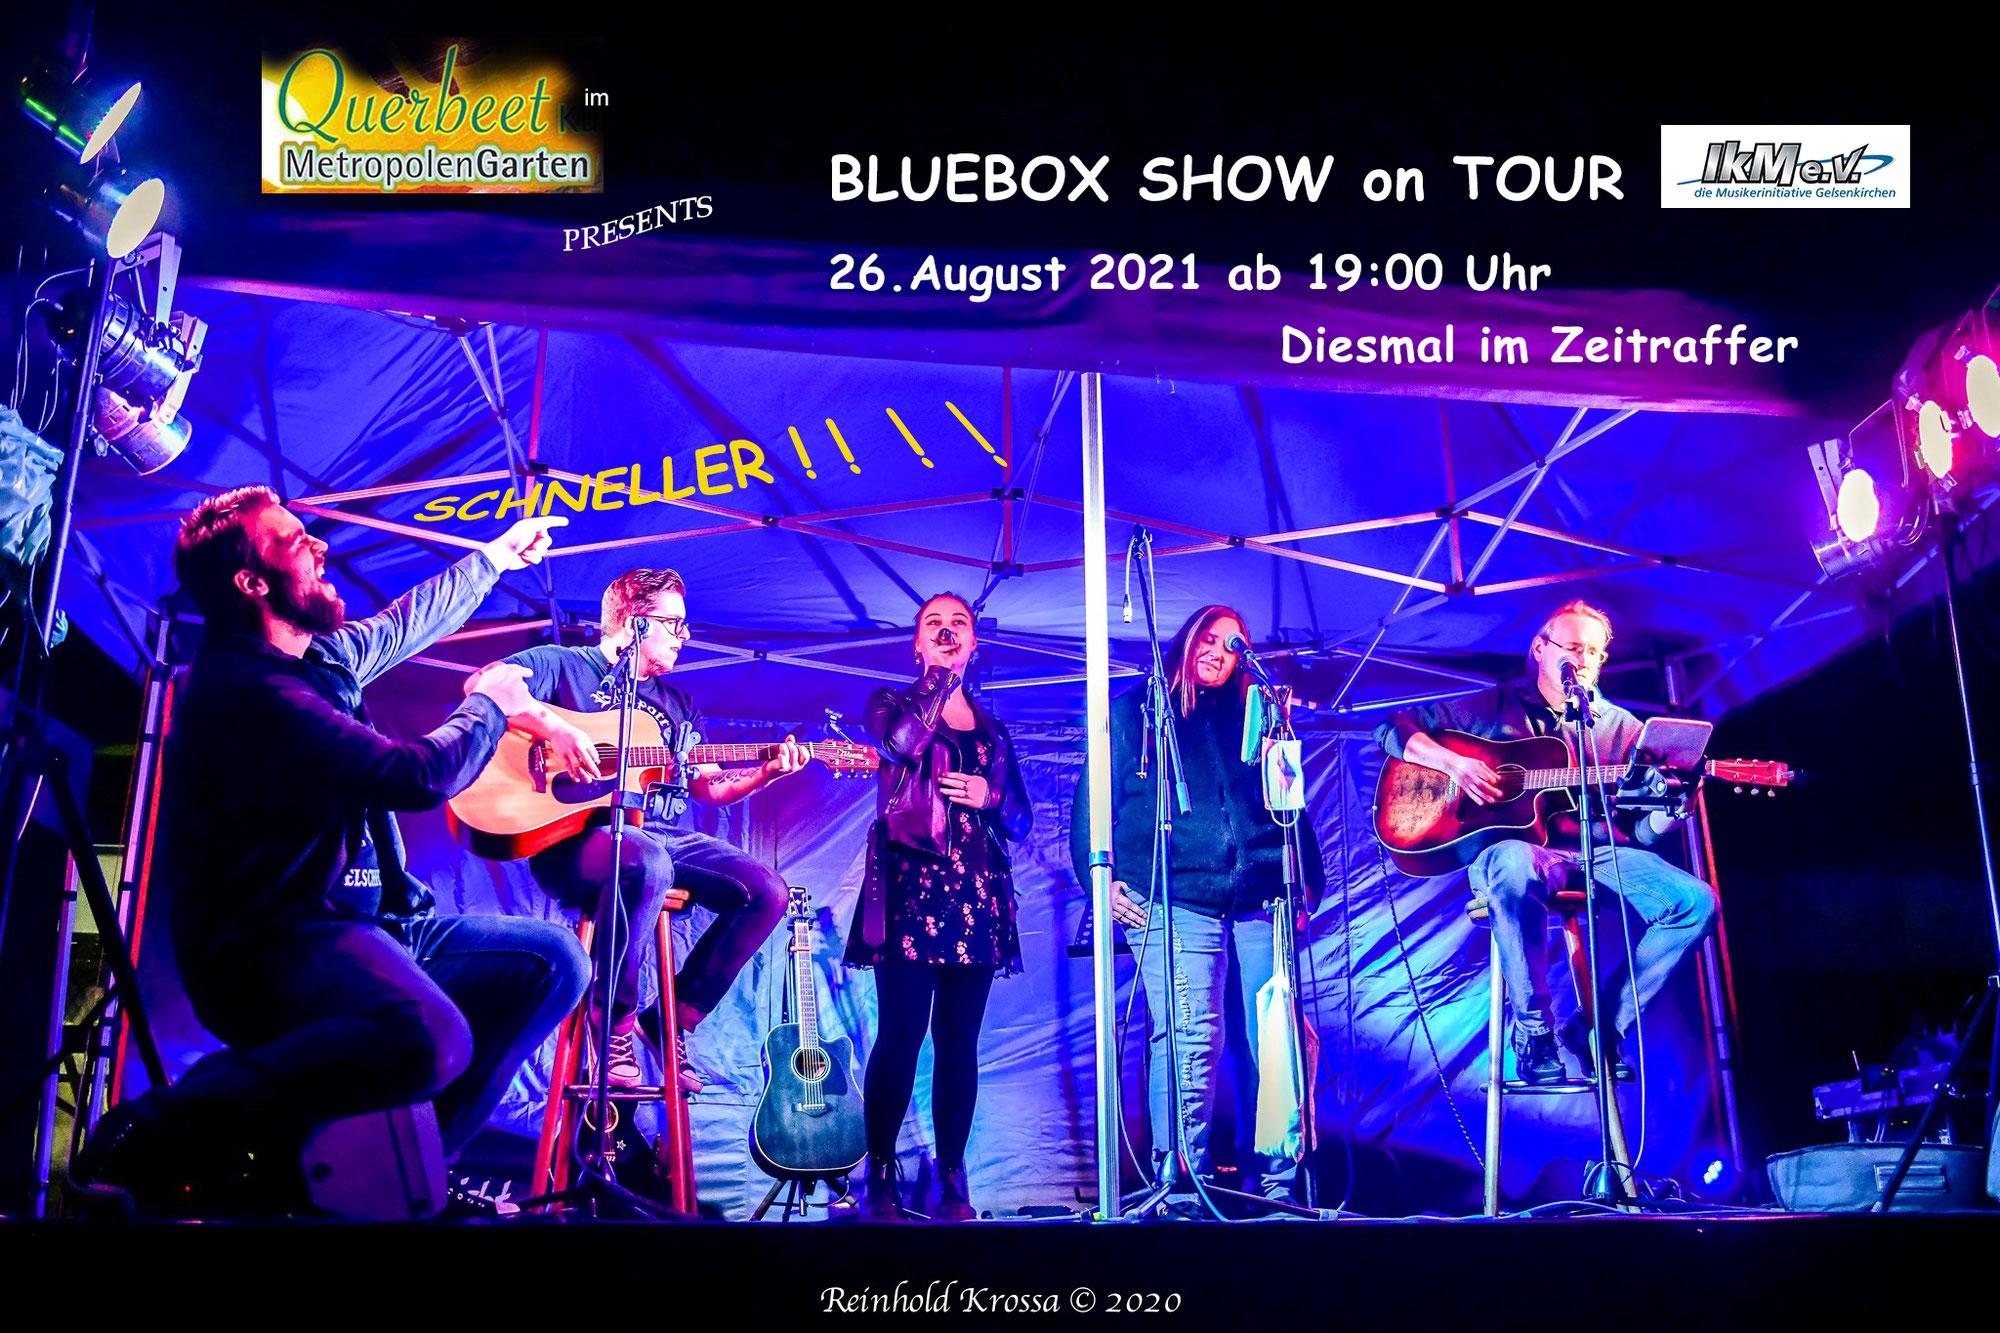 Querbeet 4.0 - Die Bluebox Show on Tour